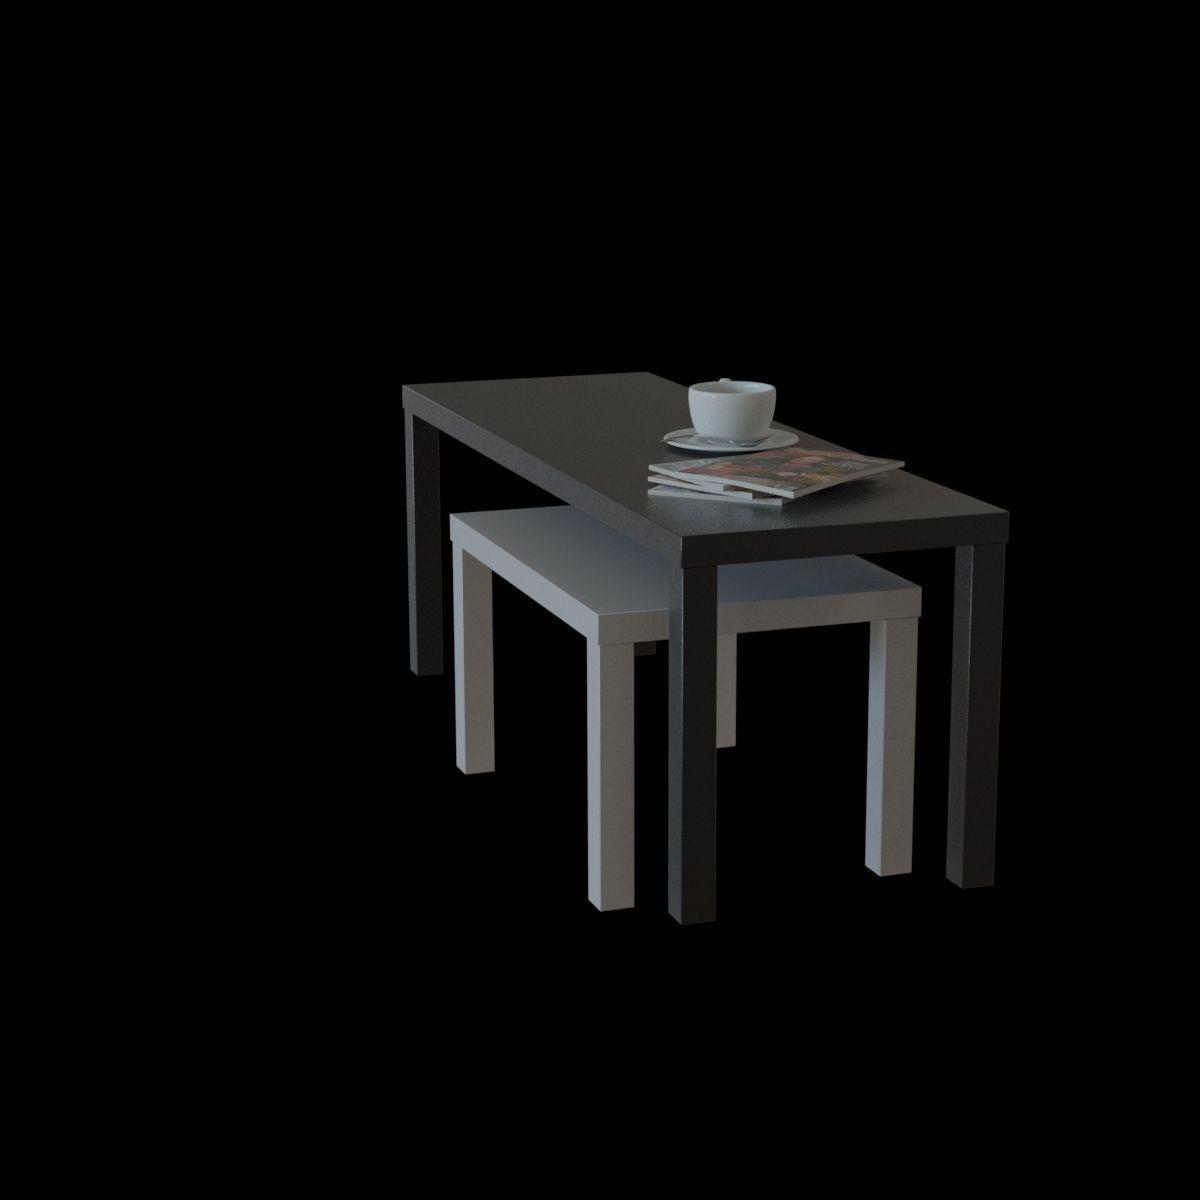 f8989b78ca6a Ikea Lack Nesting Table 3d Model